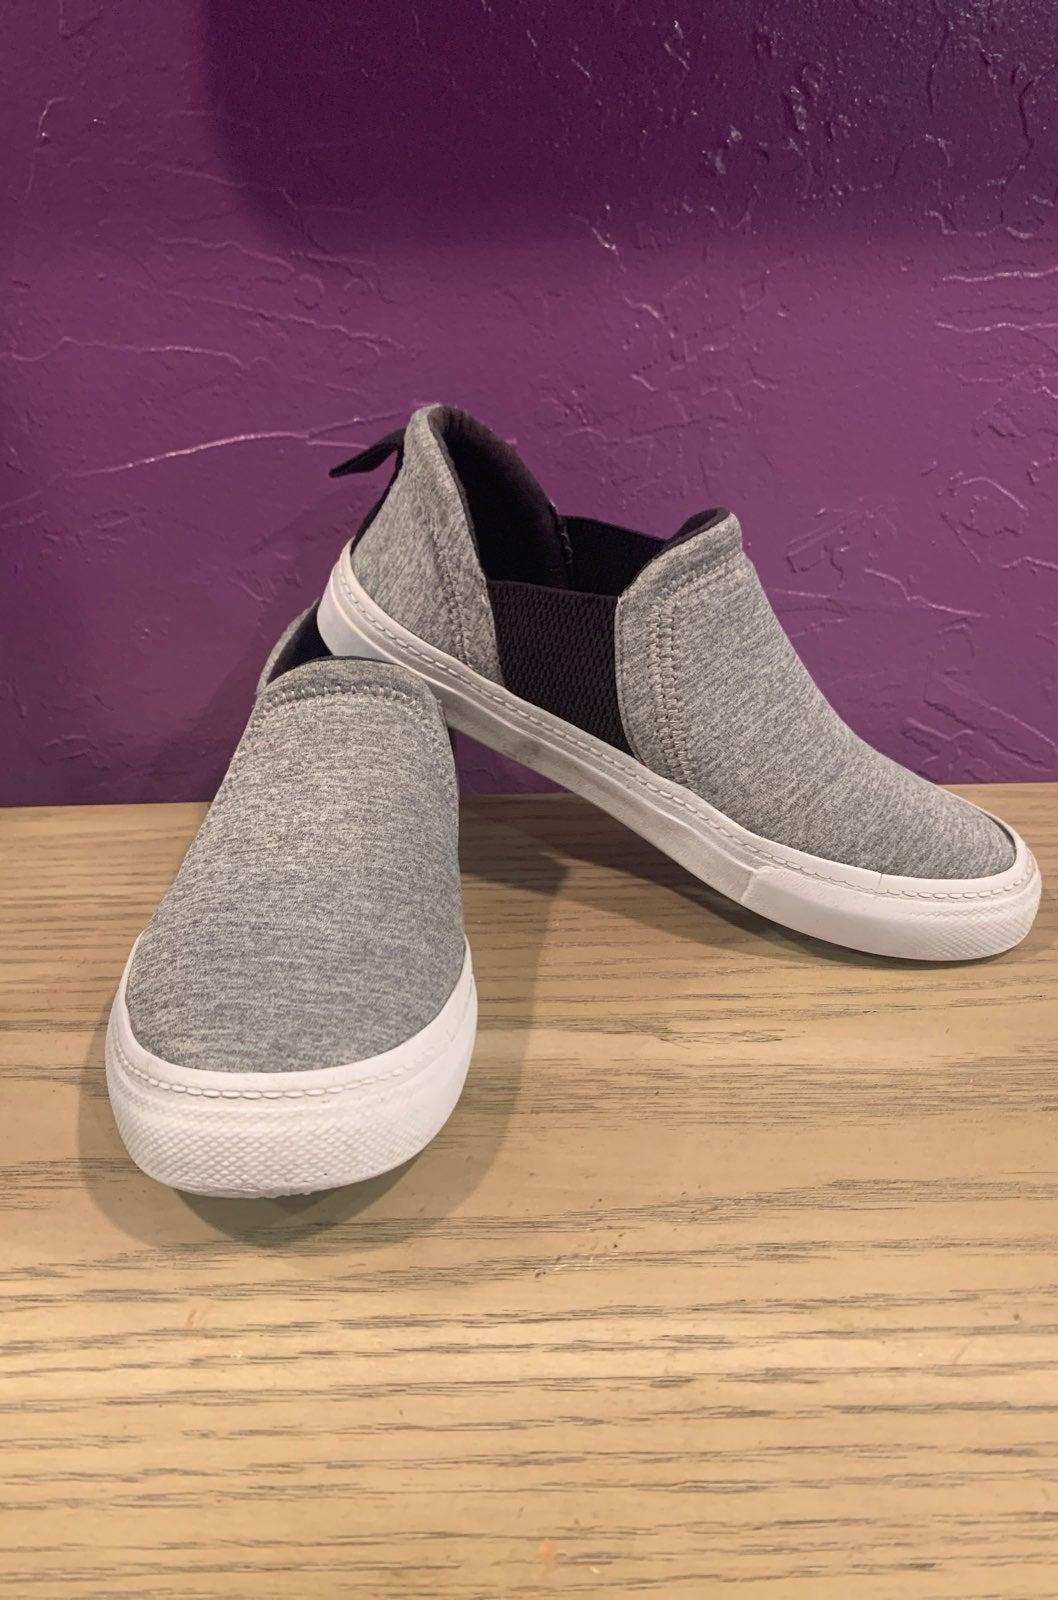 Zara Trafaluc Loafer Gray Shoes